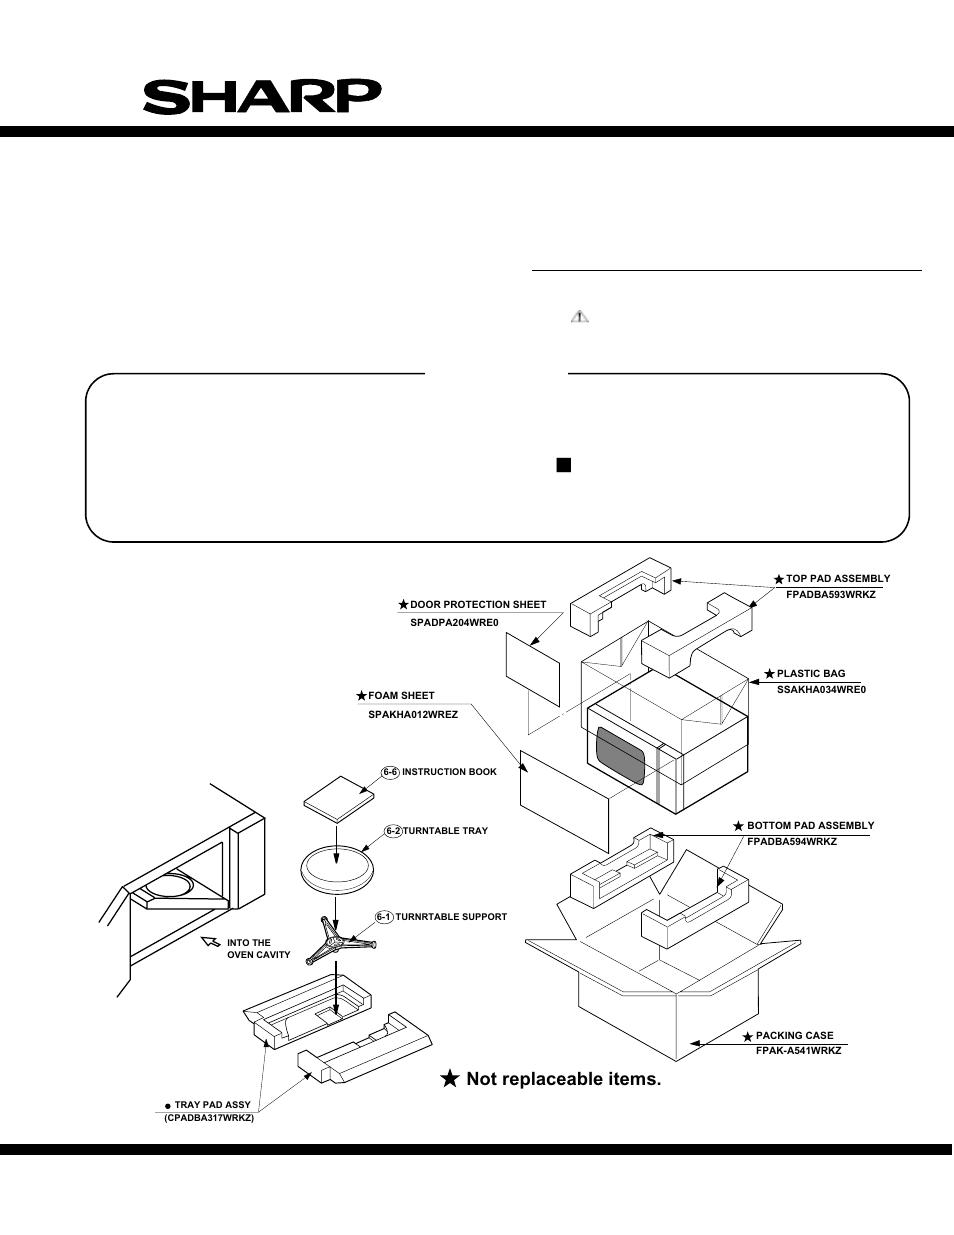 parts list r 305ks microwave oven sharp carousel r 305ks user rh manualsdir com Sharp ER-A170 sharp carousel microwave r-305ks manual